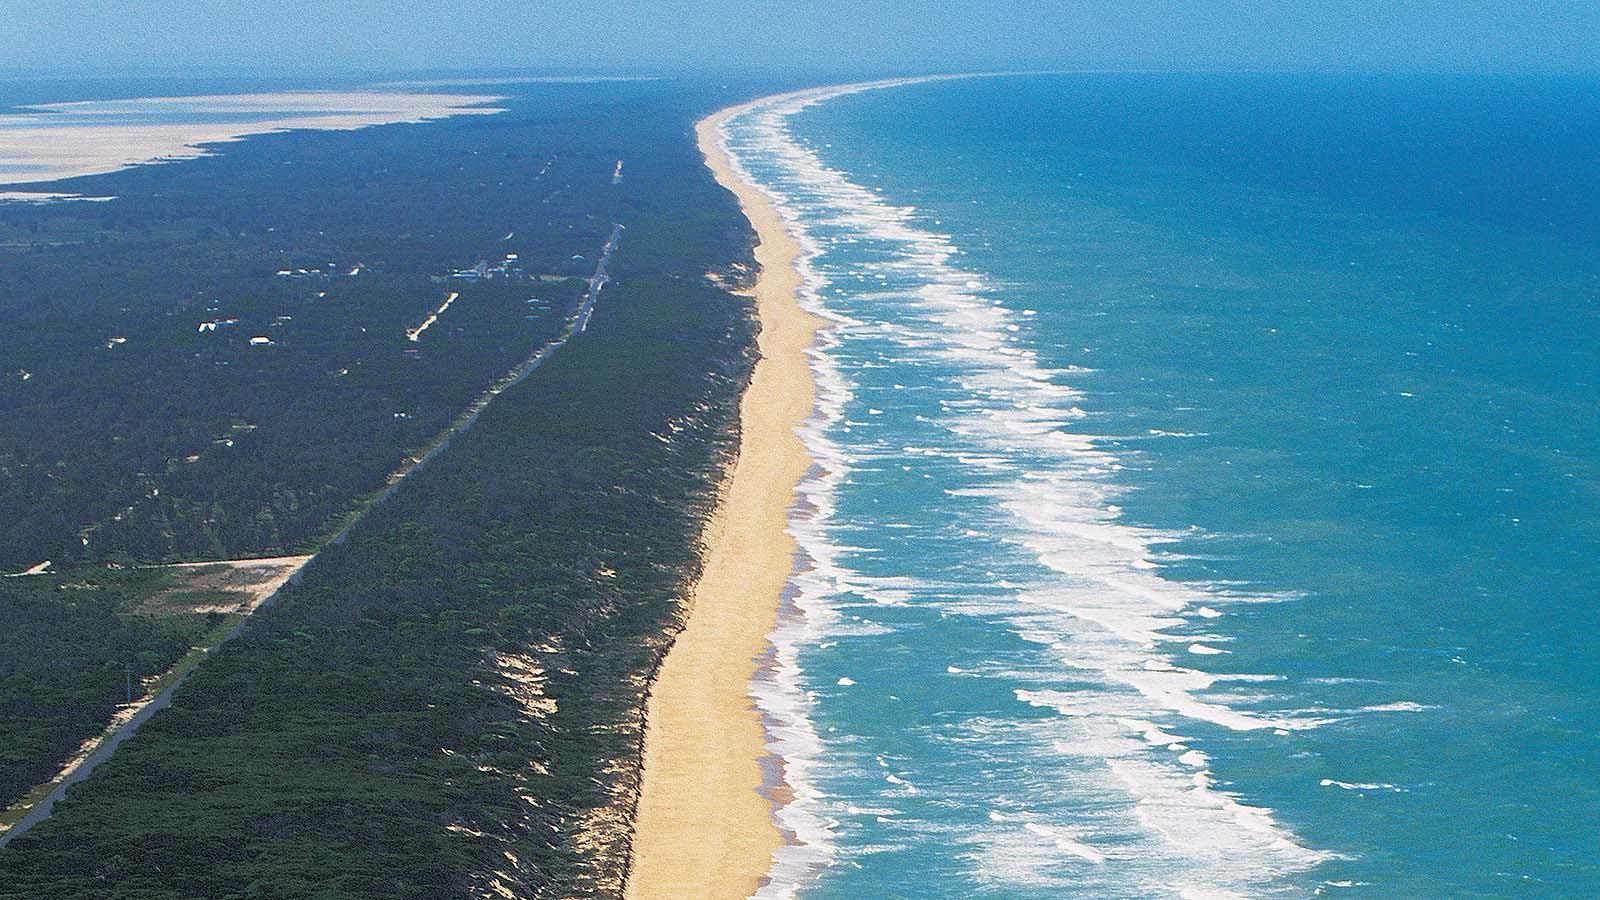 Aerial view of Ninety Mile Beach, Gippsland, Victoria, Australia